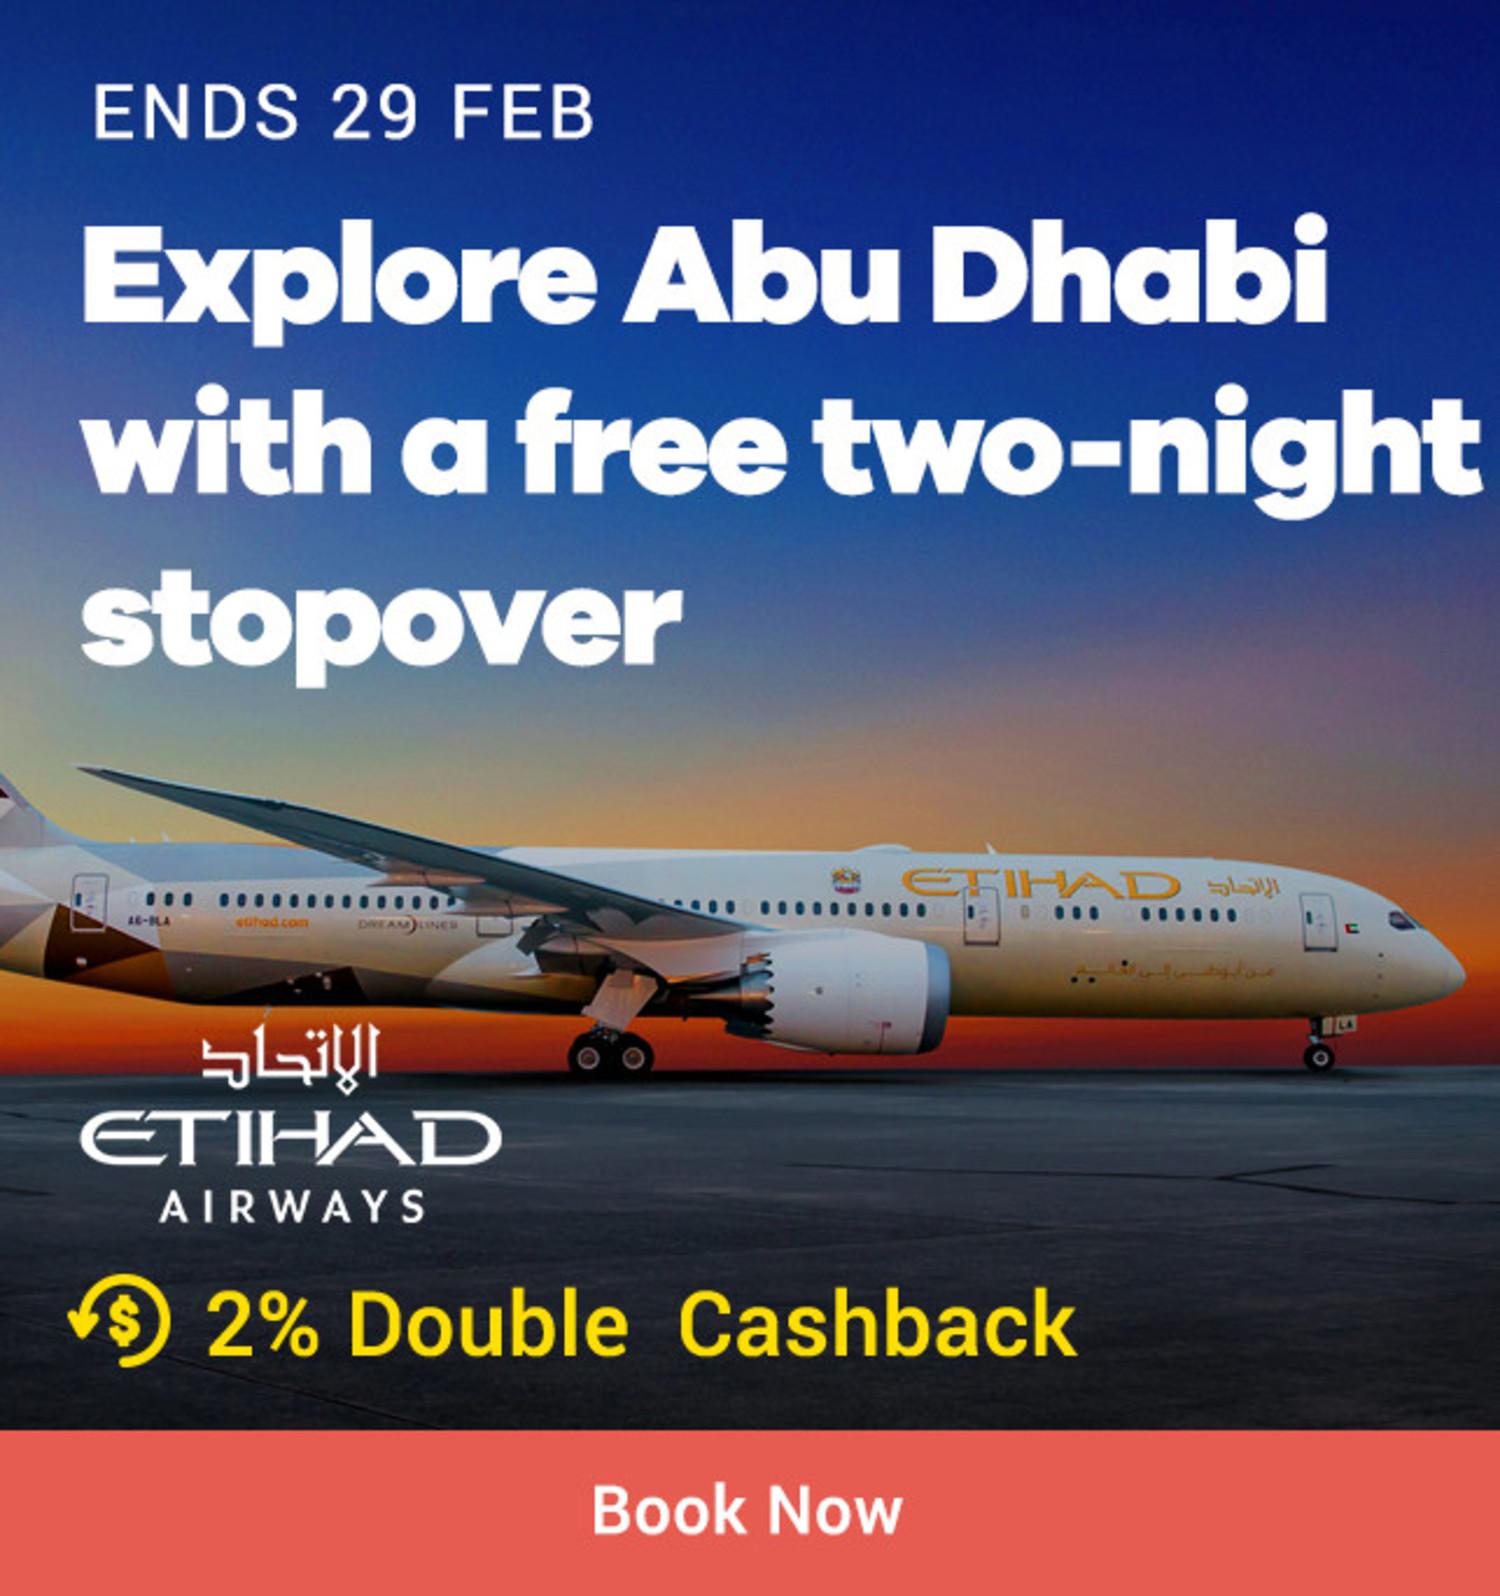 Etihad Airways: Explore Abu Dhabi with free two night stopover